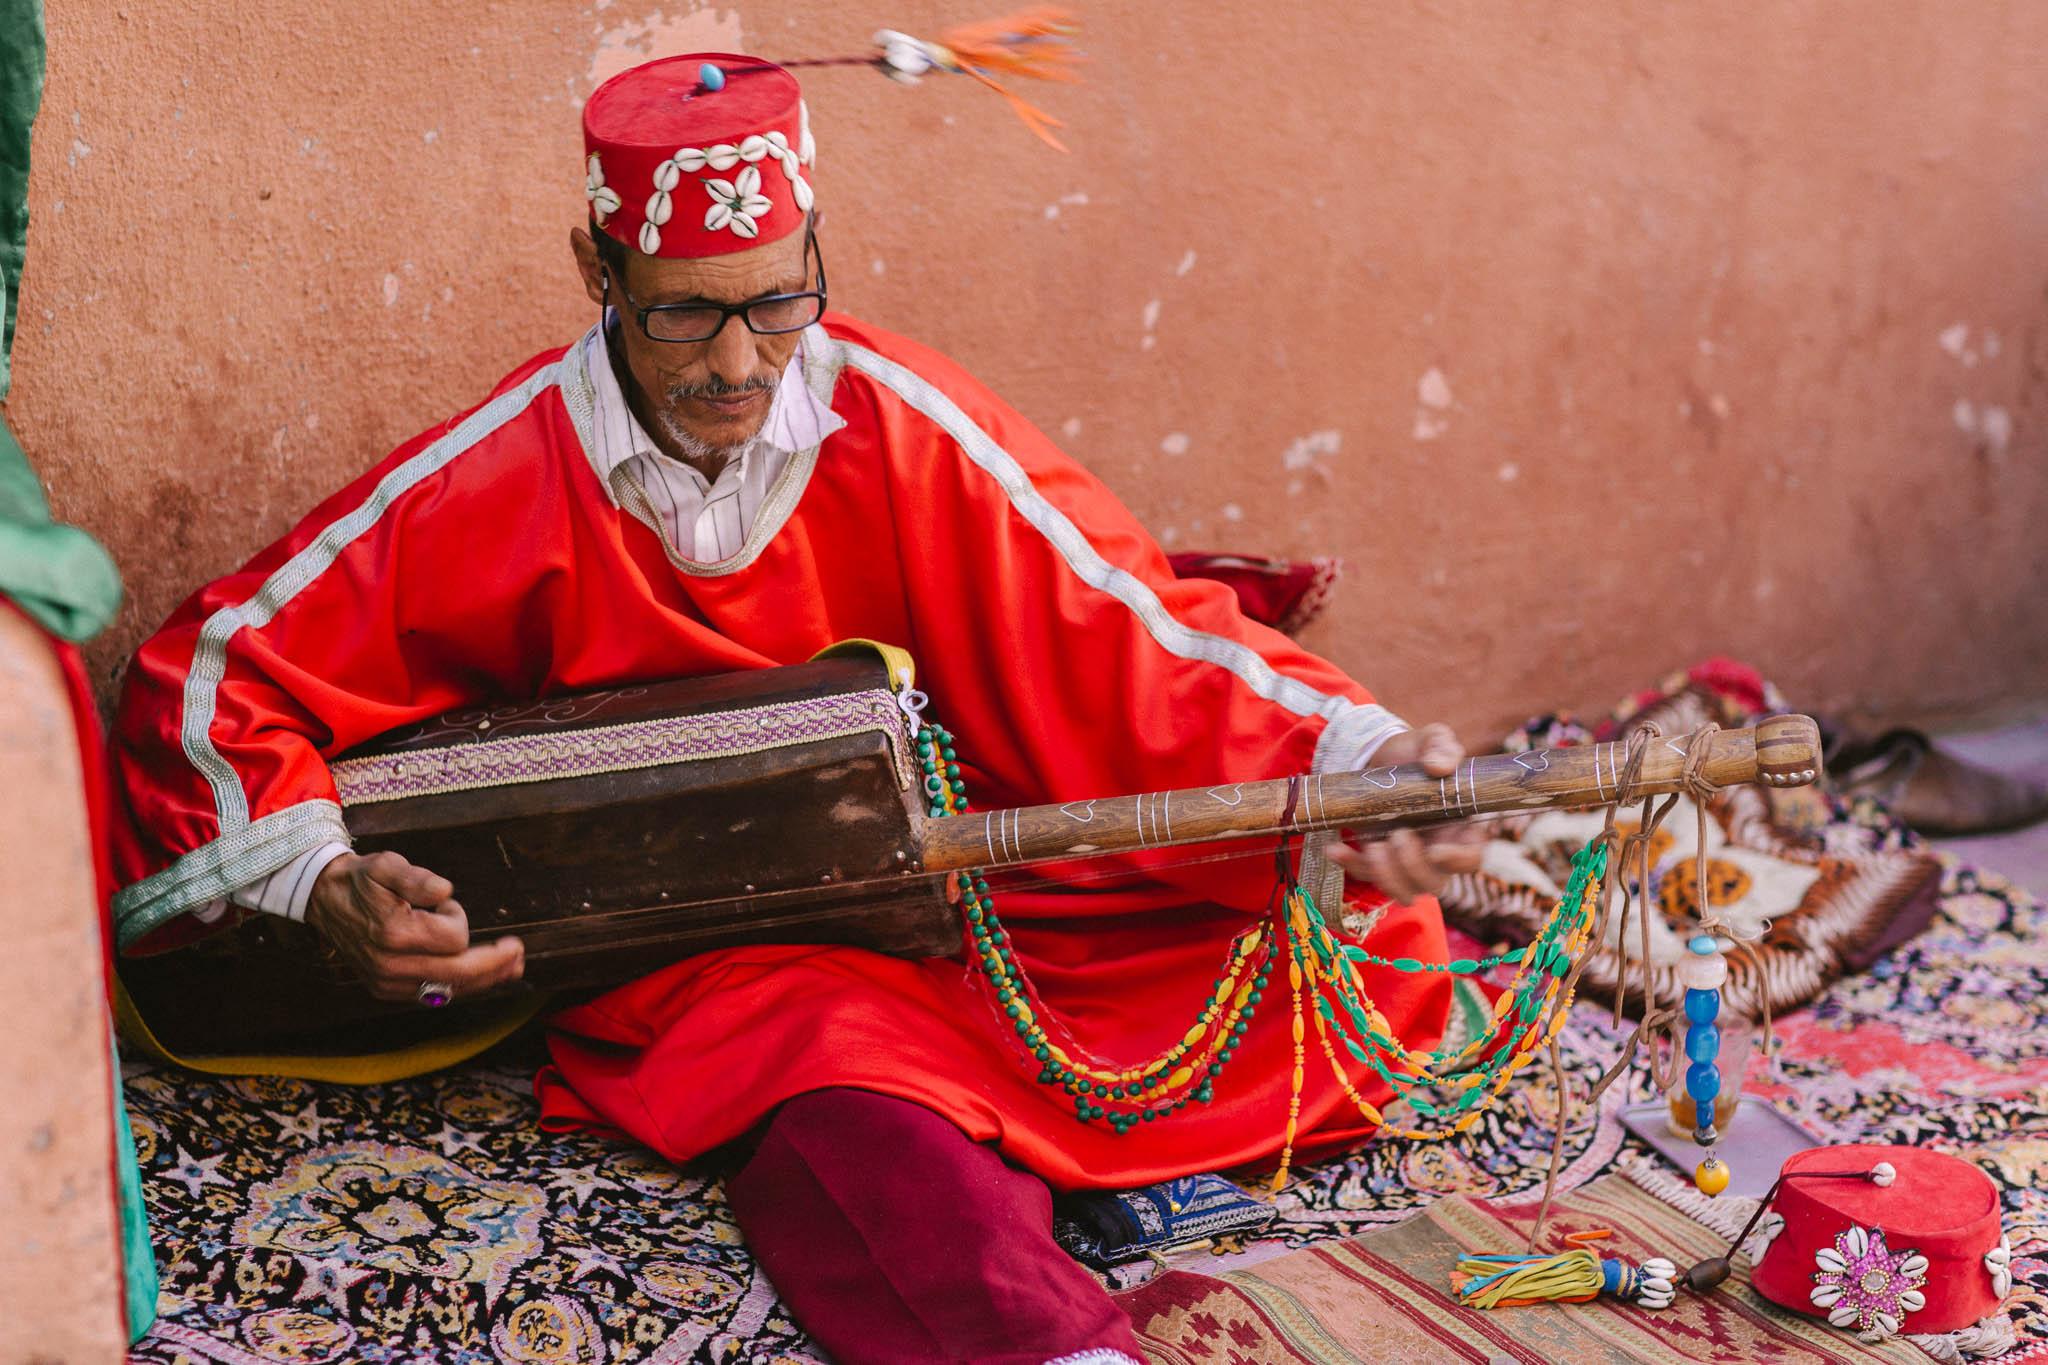 luksusowe podróże butikowe My Boutique Travel - Maroko